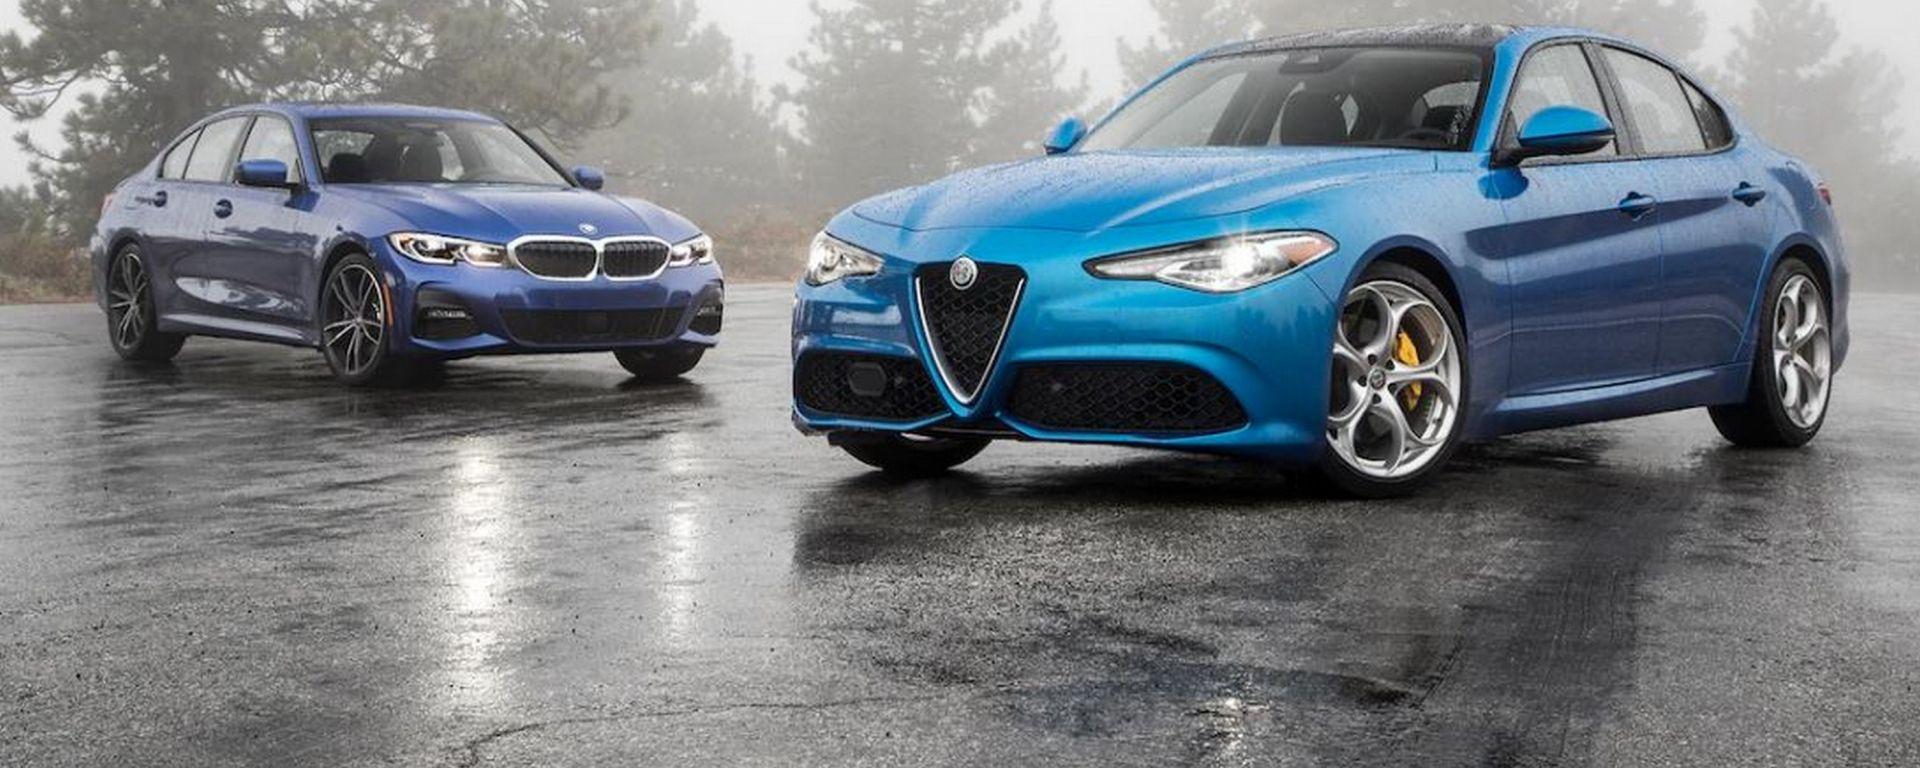 Affidabilità: Alfa Romeo batte BMW, Mercedes, Opel, Audi e Volkswagen. La ricerca